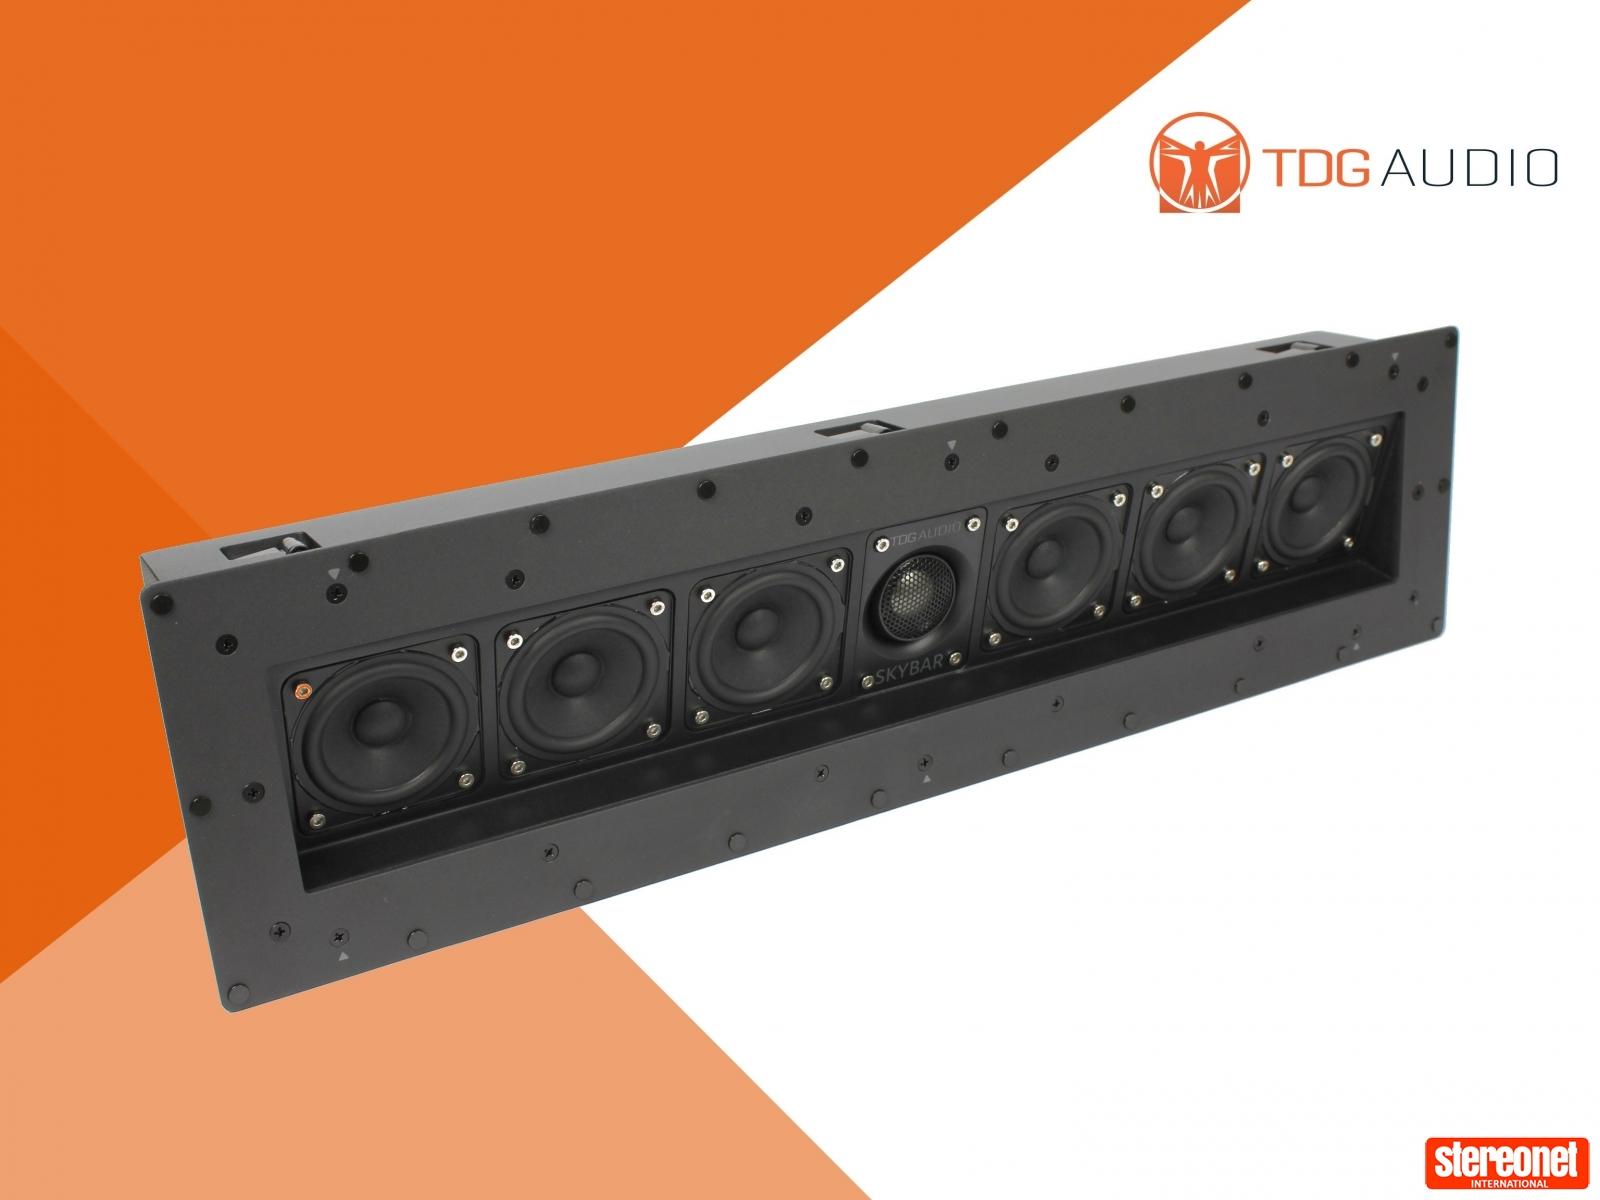 TDG Audio Skybar